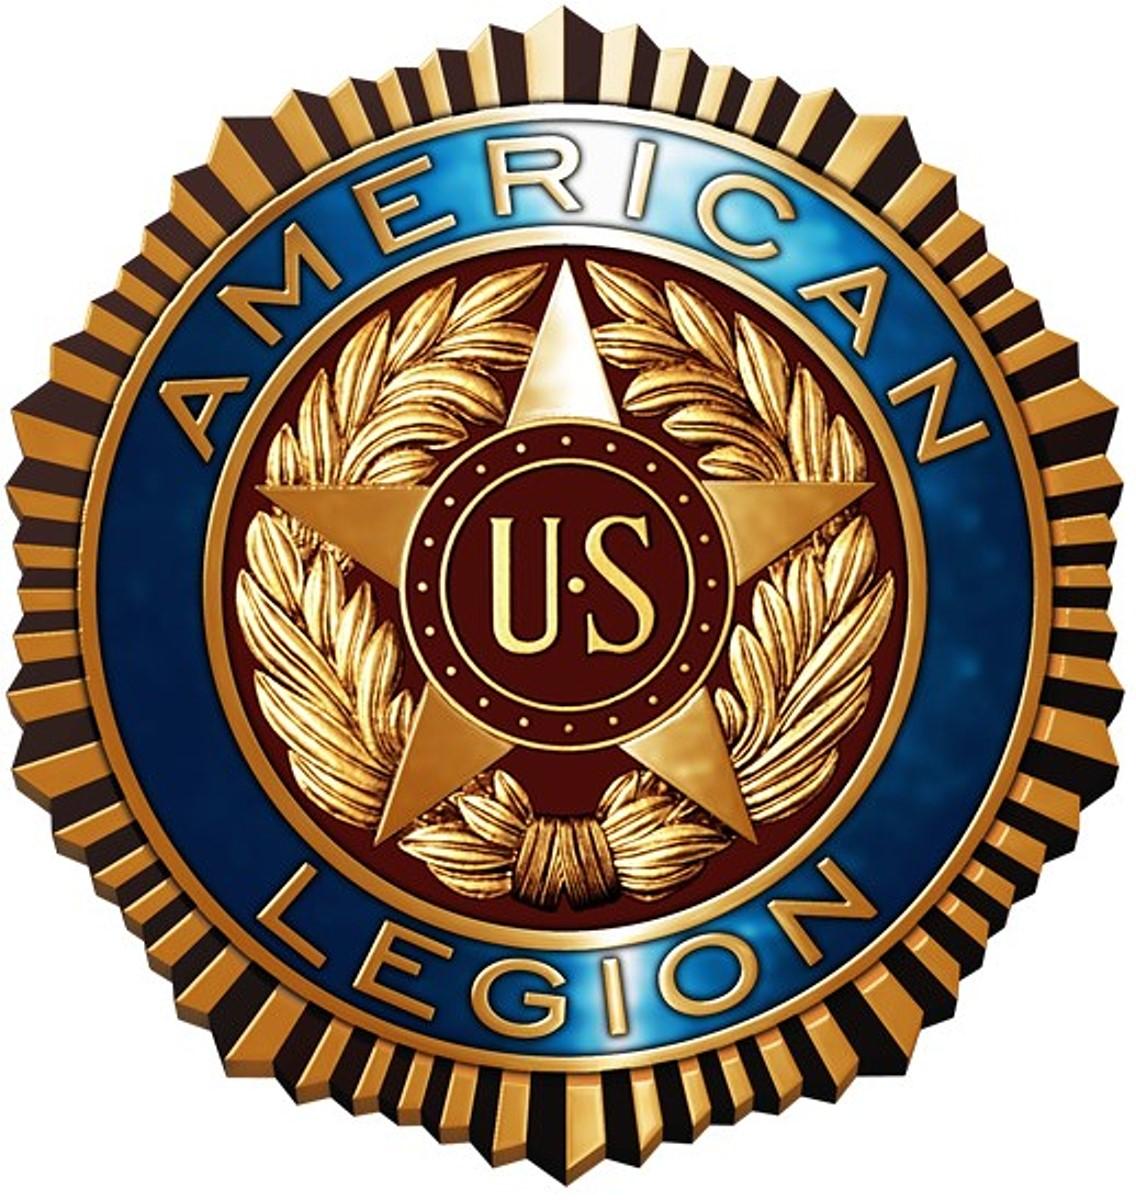 american legion logo png transparent american legion logo png images rh pluspng com american legion eagle logo vector american legion baseball logo vector